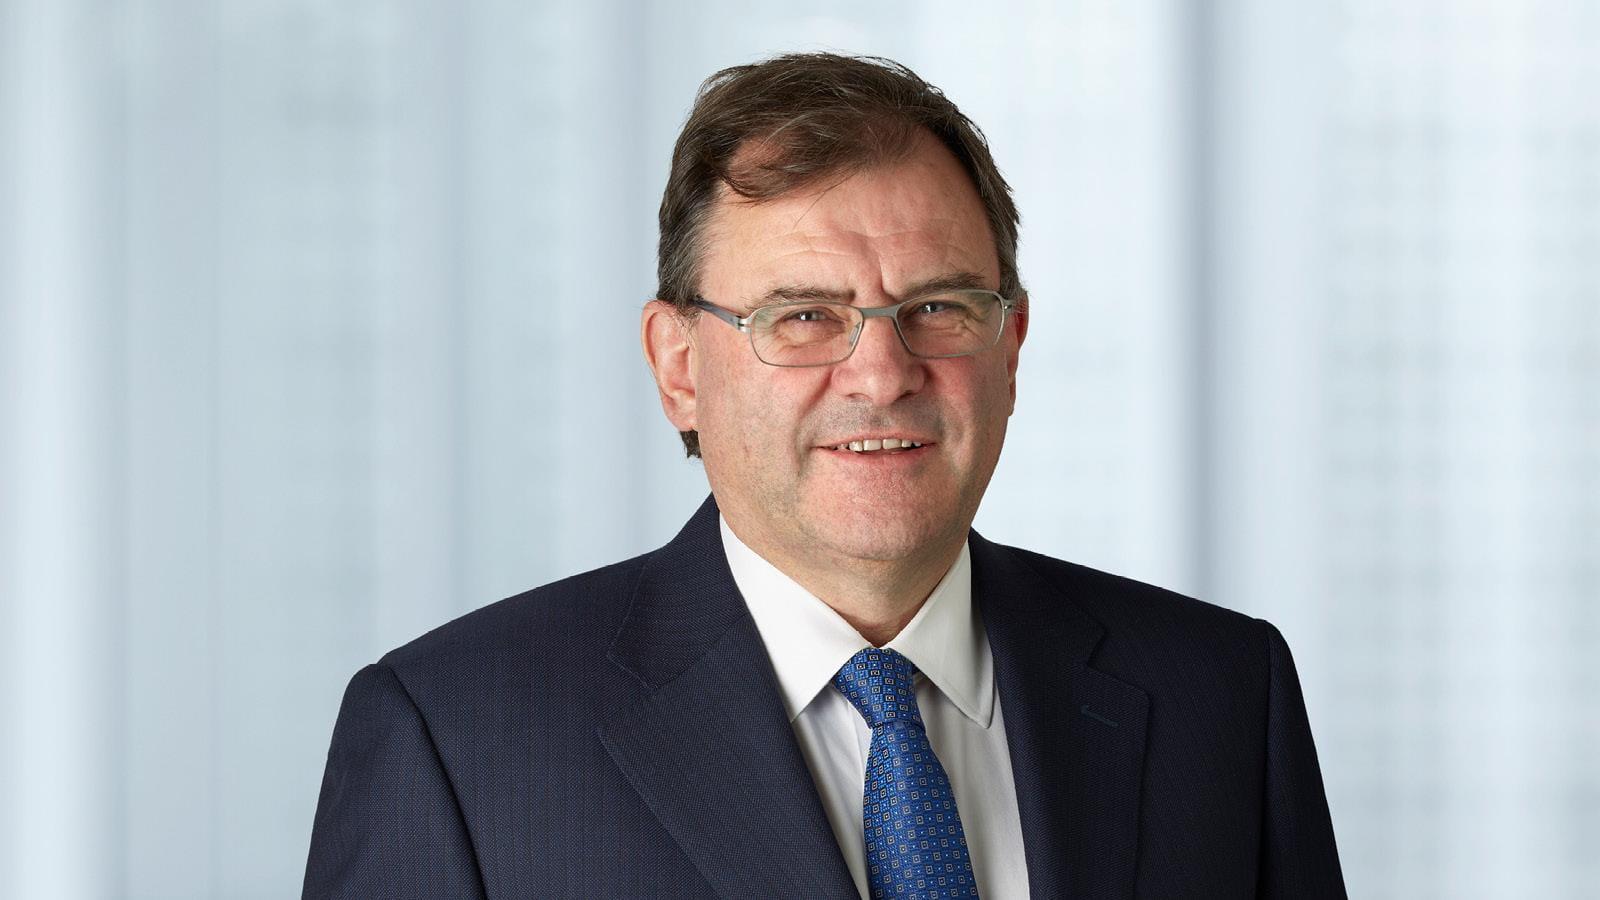 portrait photo of Professor Duncan Maskell